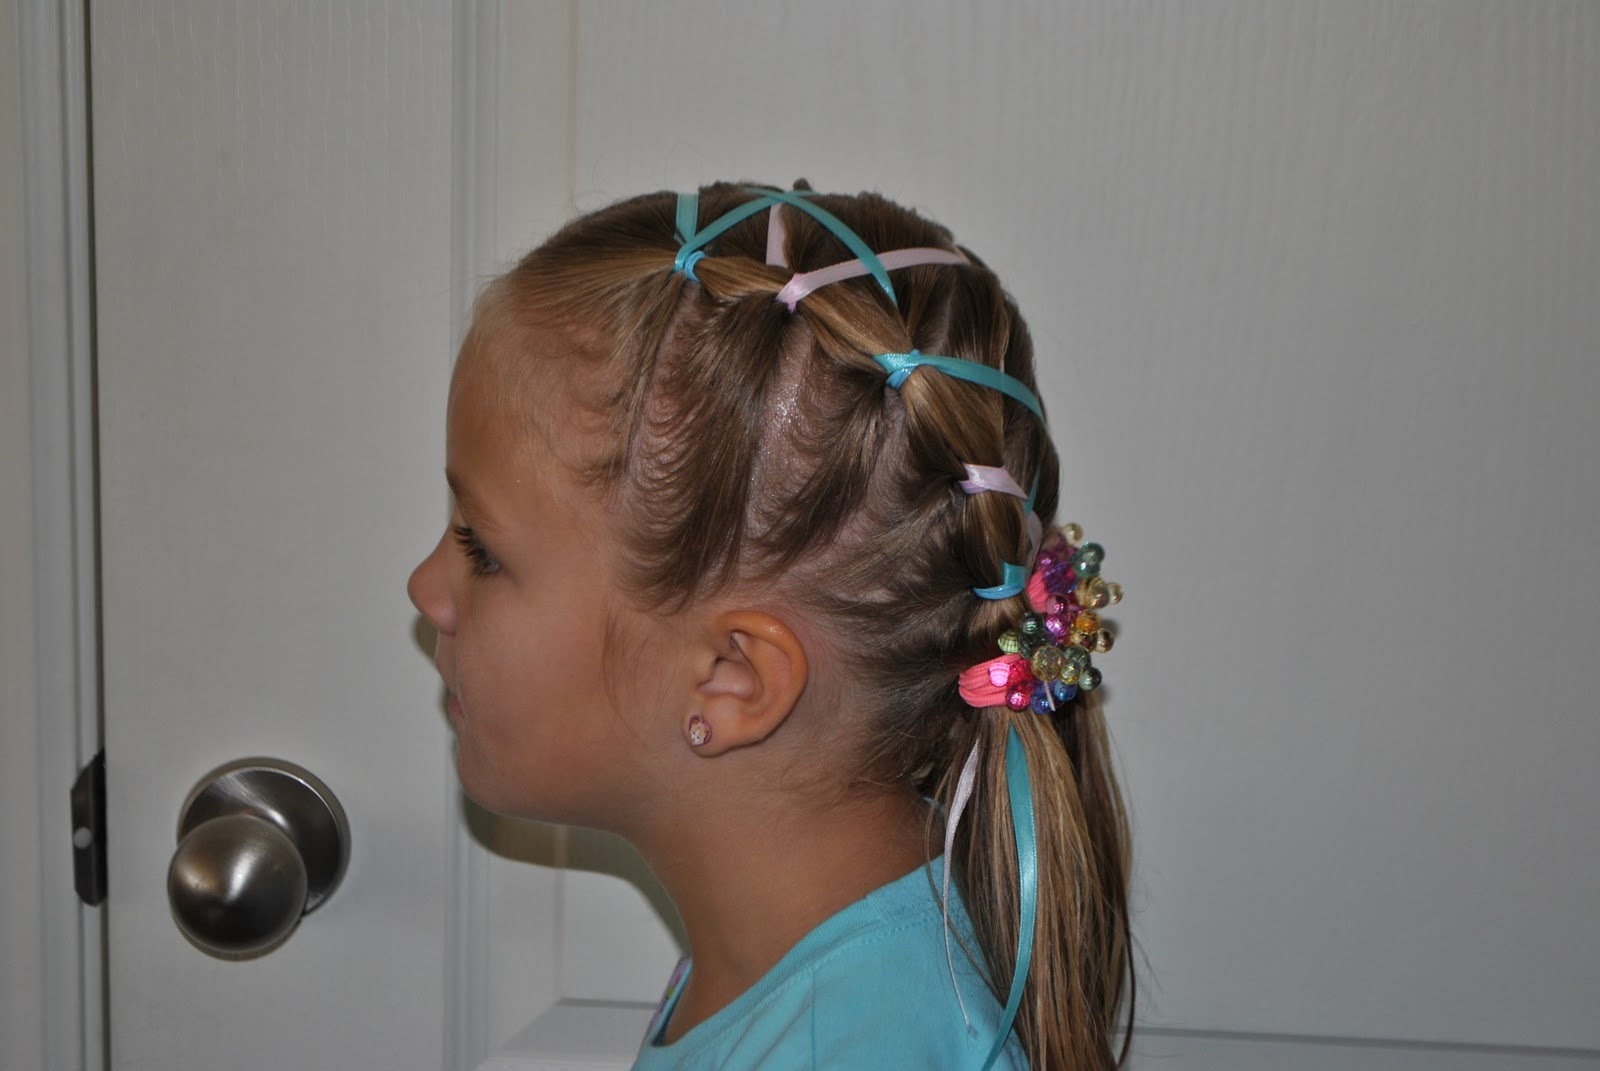 Rapunzel, Rapunzel, let down your golden hair: Rubber band